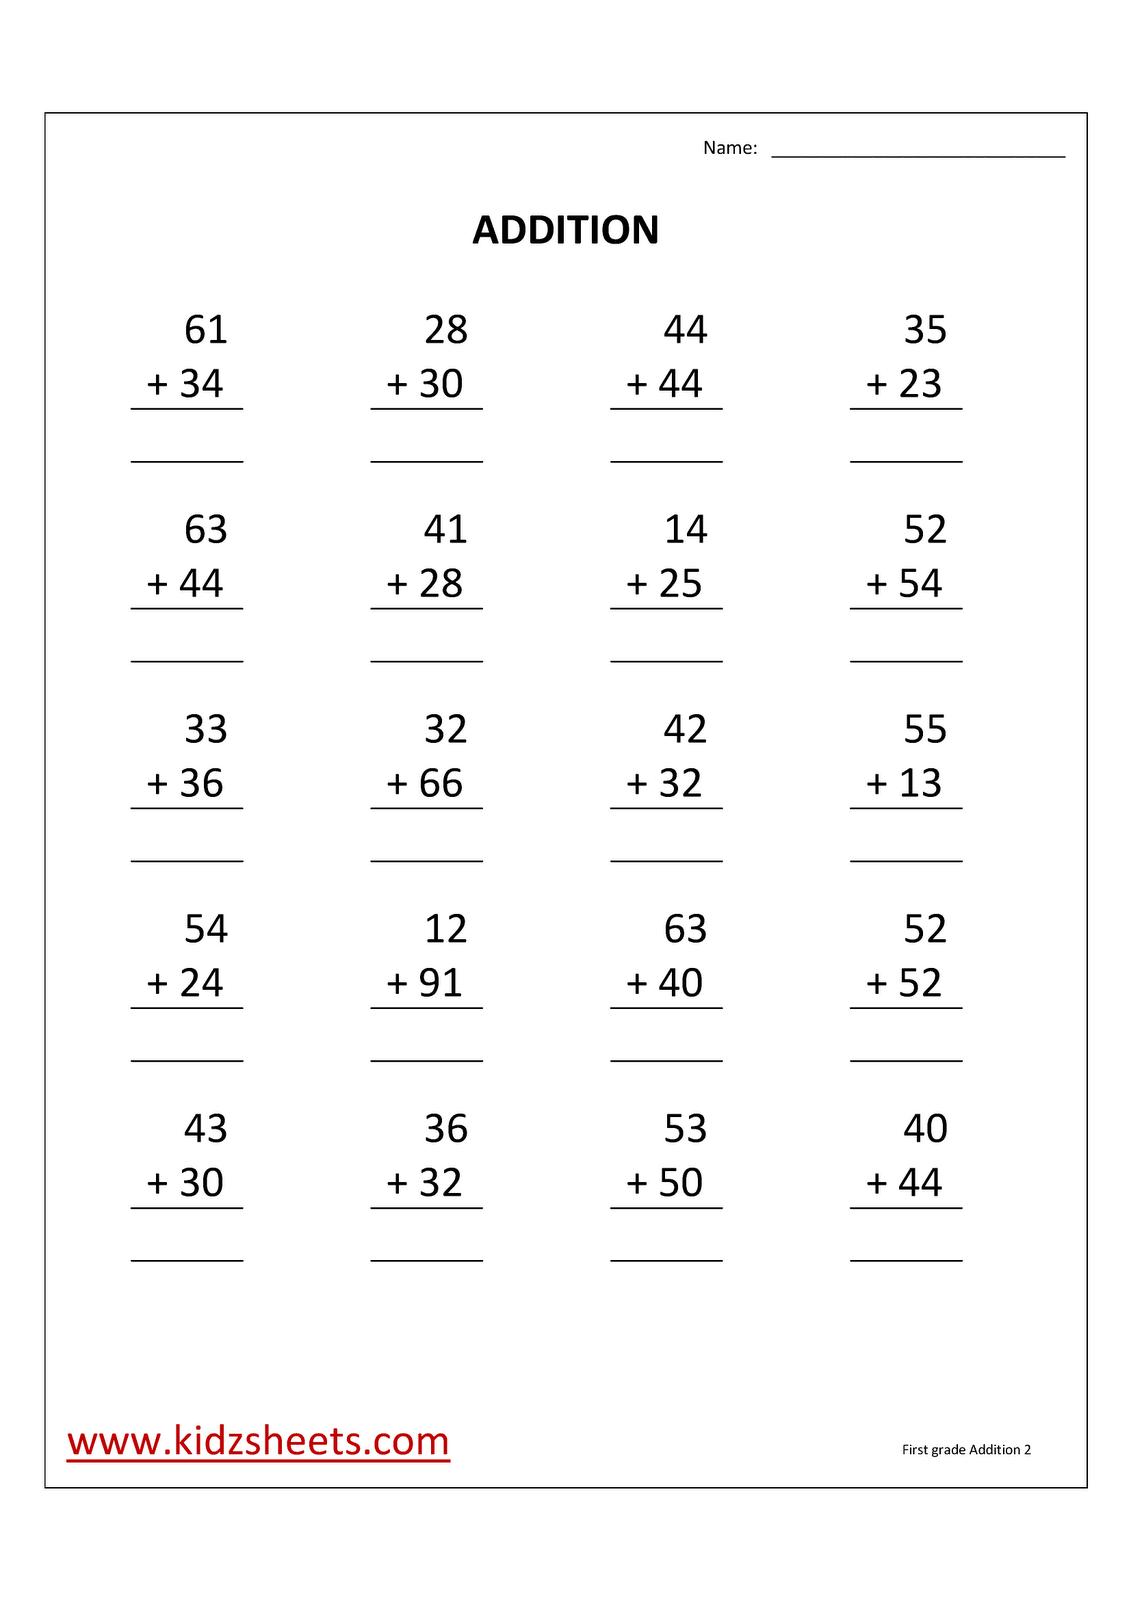 1St Grade Addition Worksheets – Fun Addition Worksheets for 1st Grade